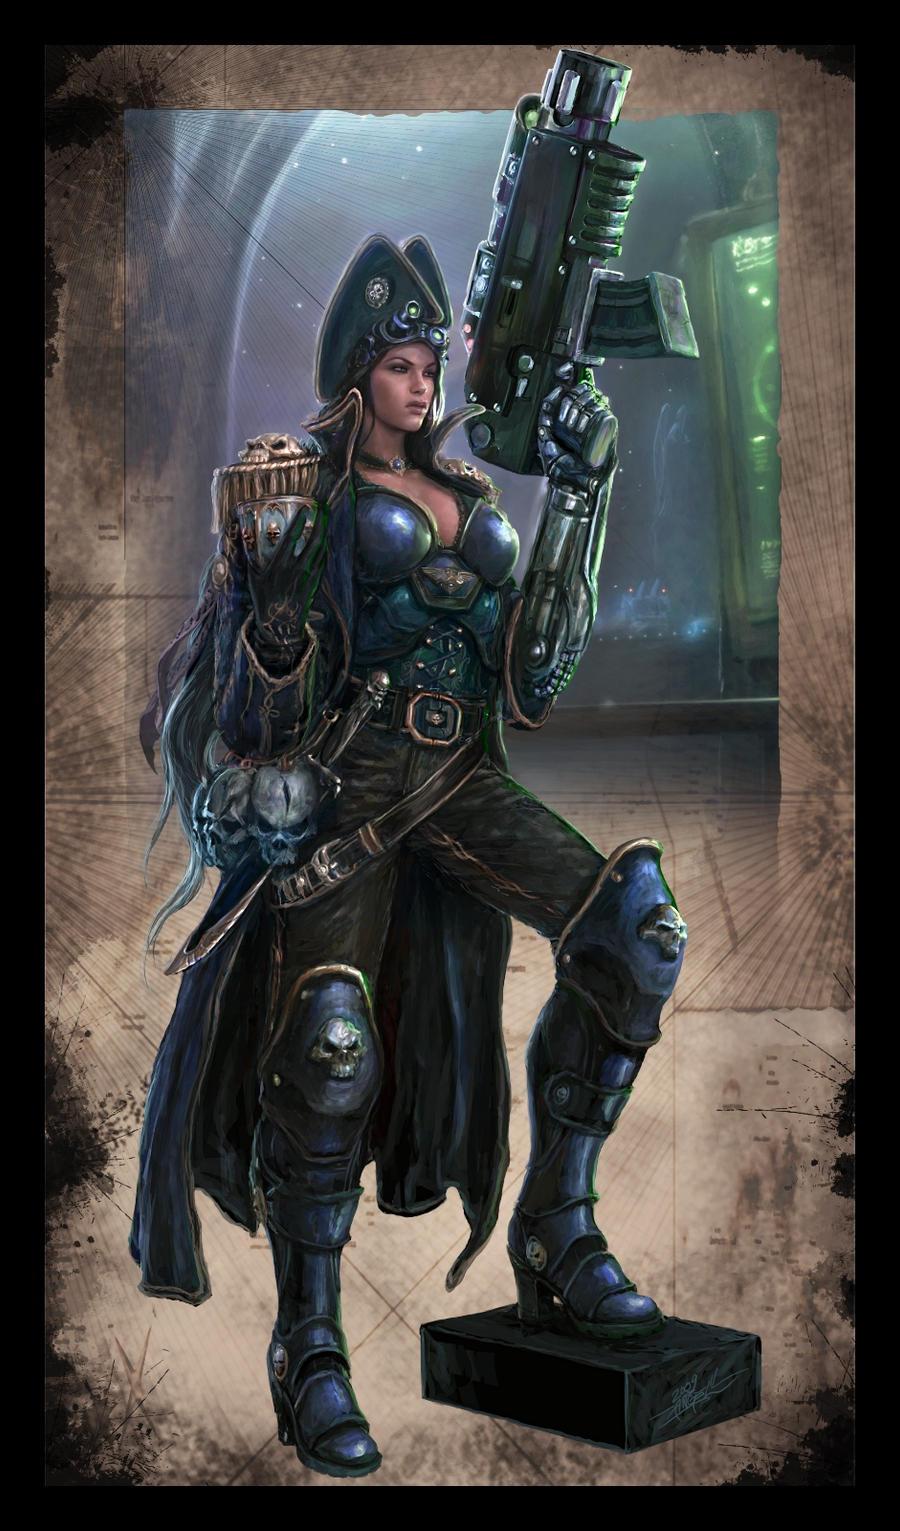 Warhammer 40k - Rogue Trader - Lorayne